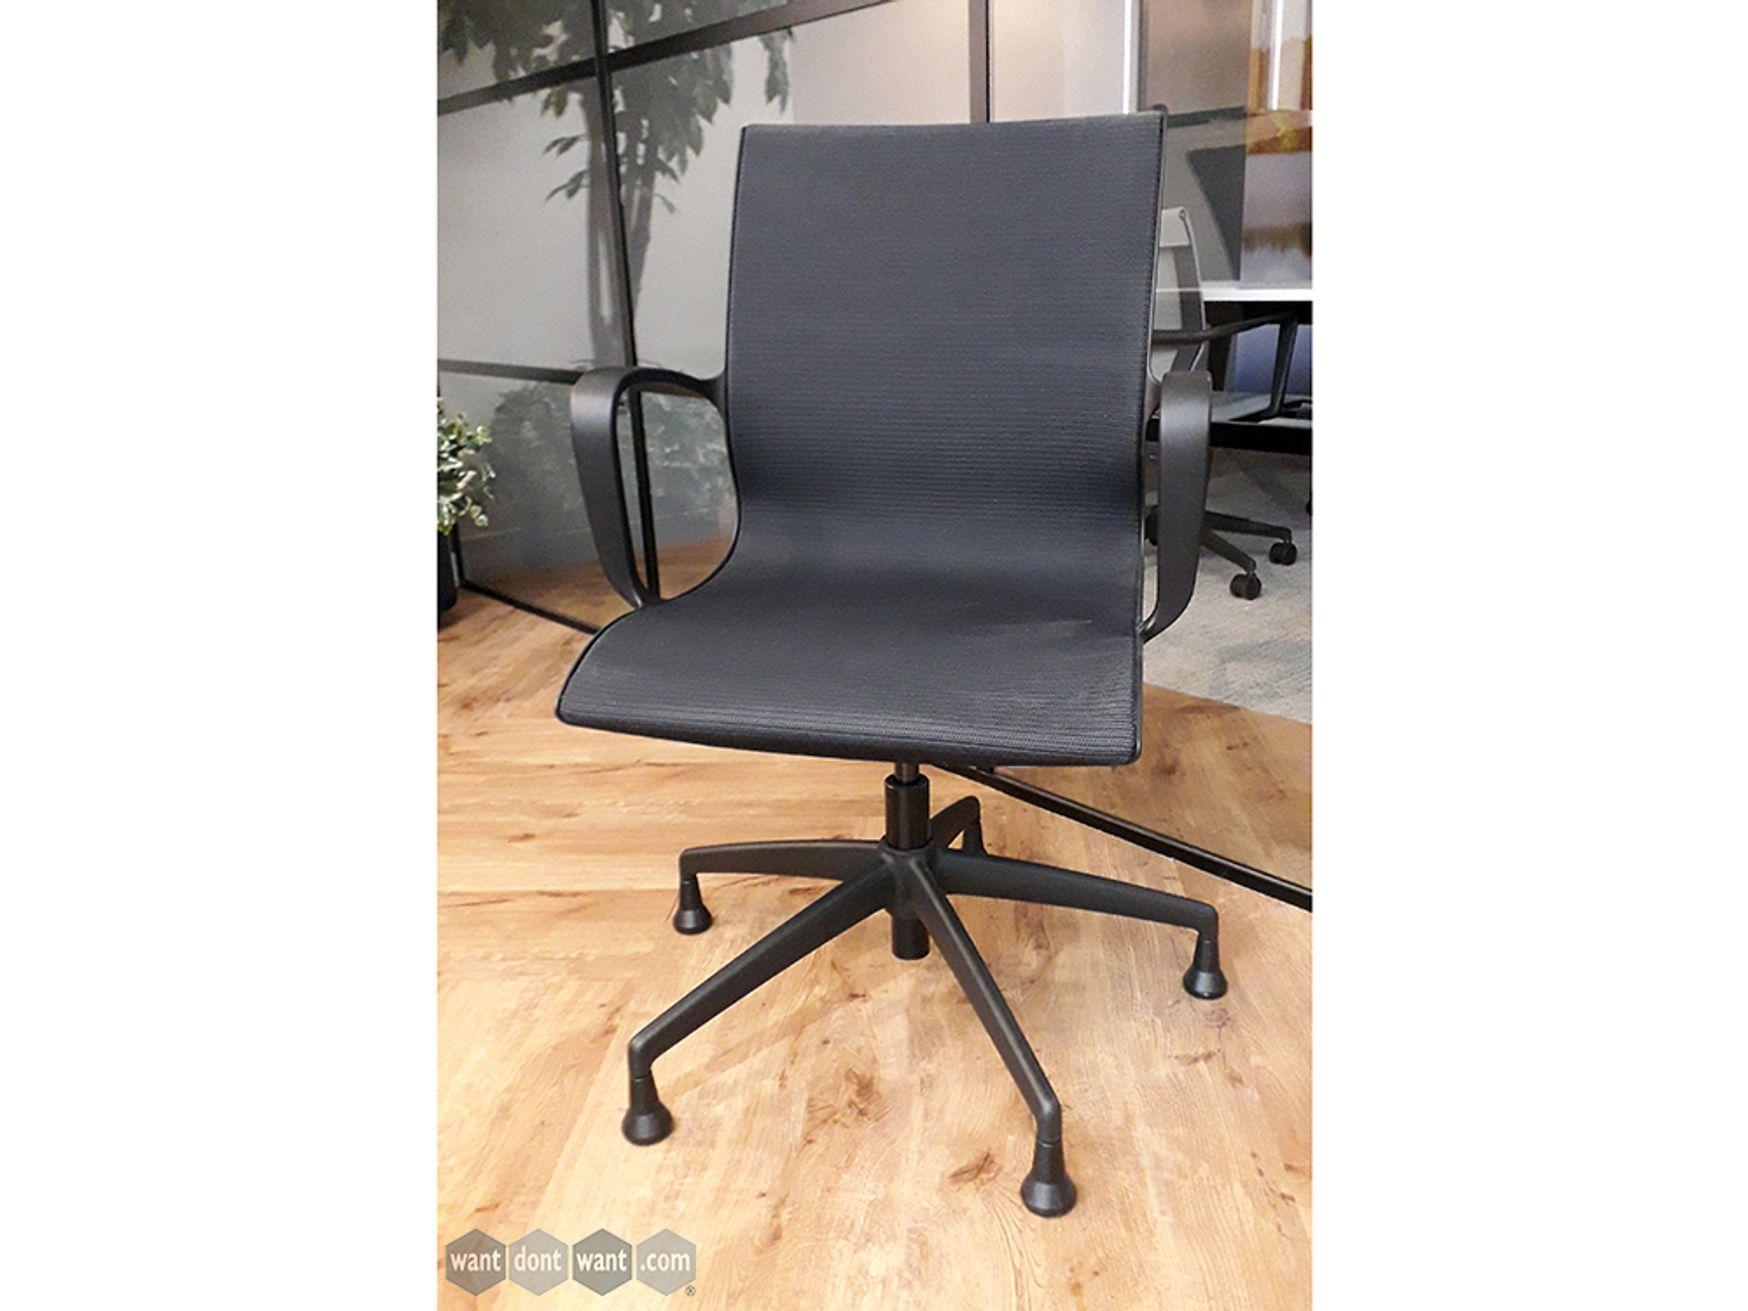 Used Boss Design Kara chair on glides